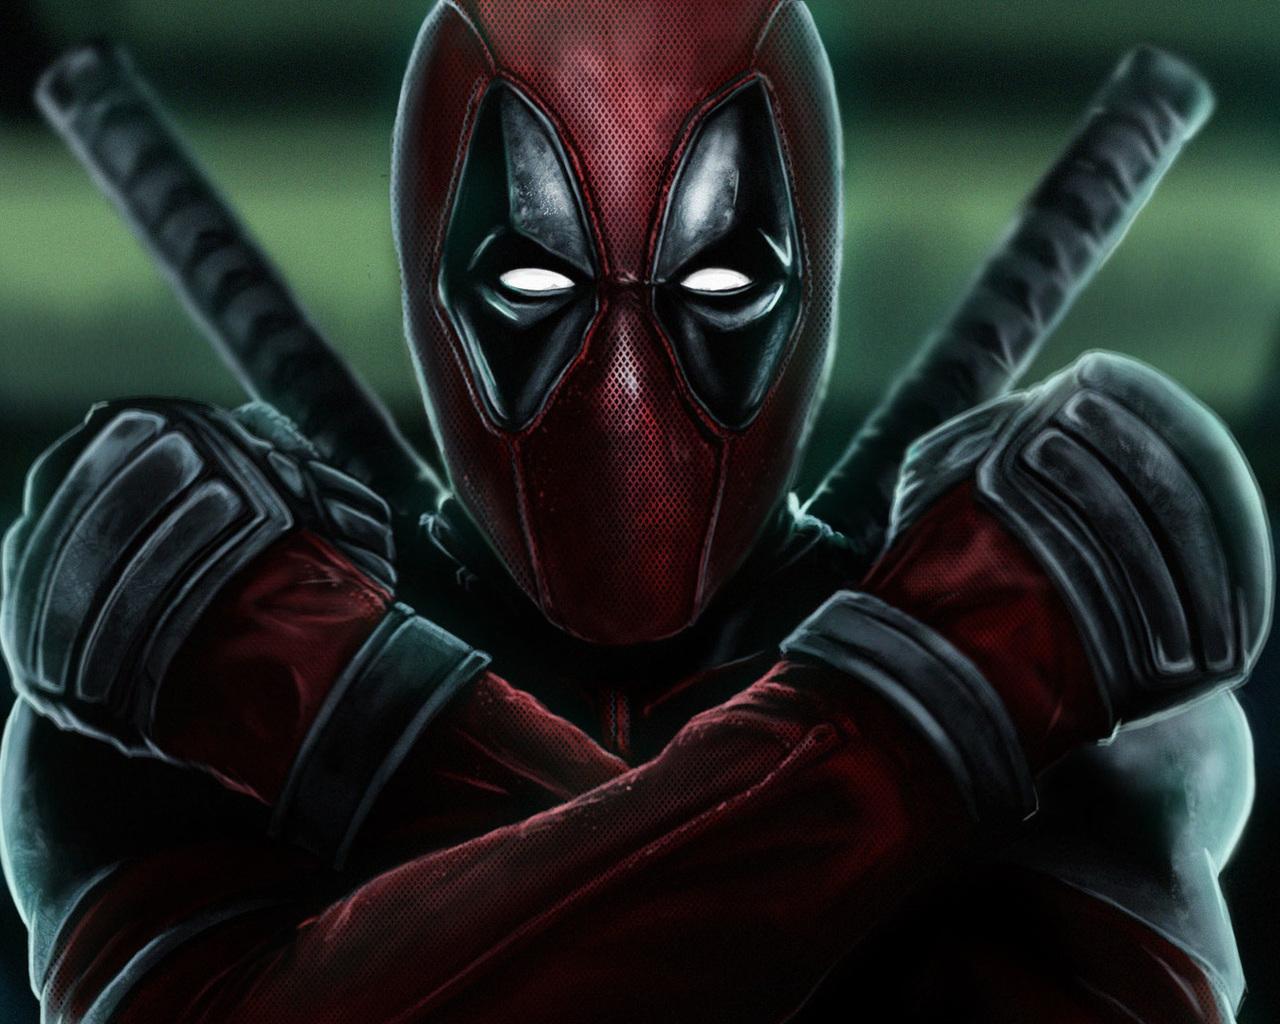 1280x1024 Deadpool 2 X Force Art